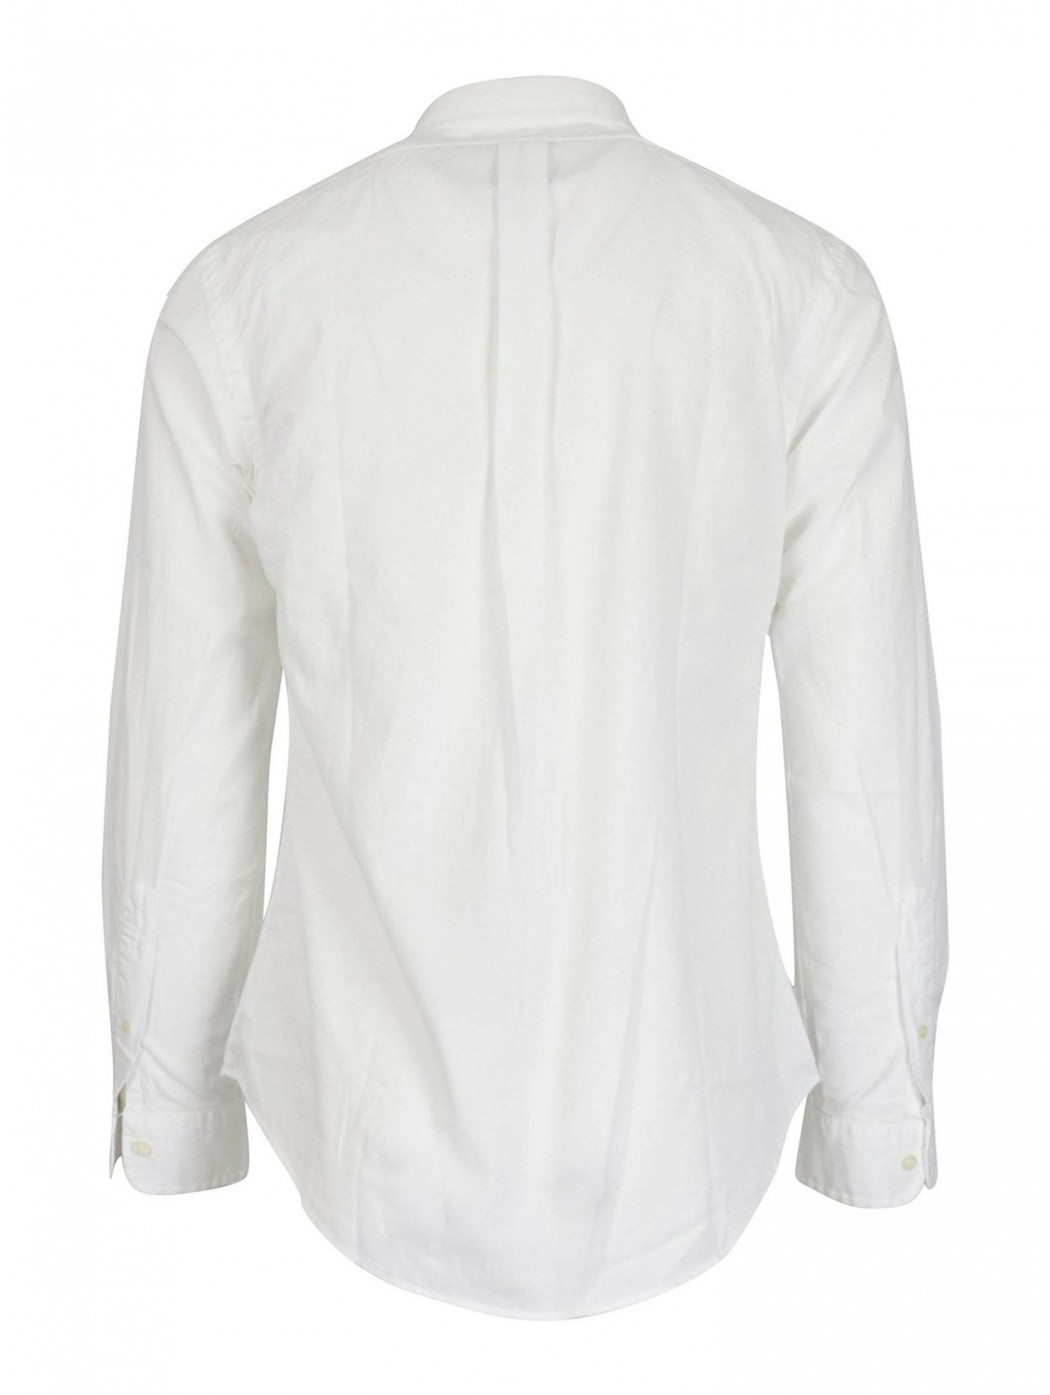 Camicia in chambray Slim-Fit POLO RALPH LAUREN UOMO 710795457 001